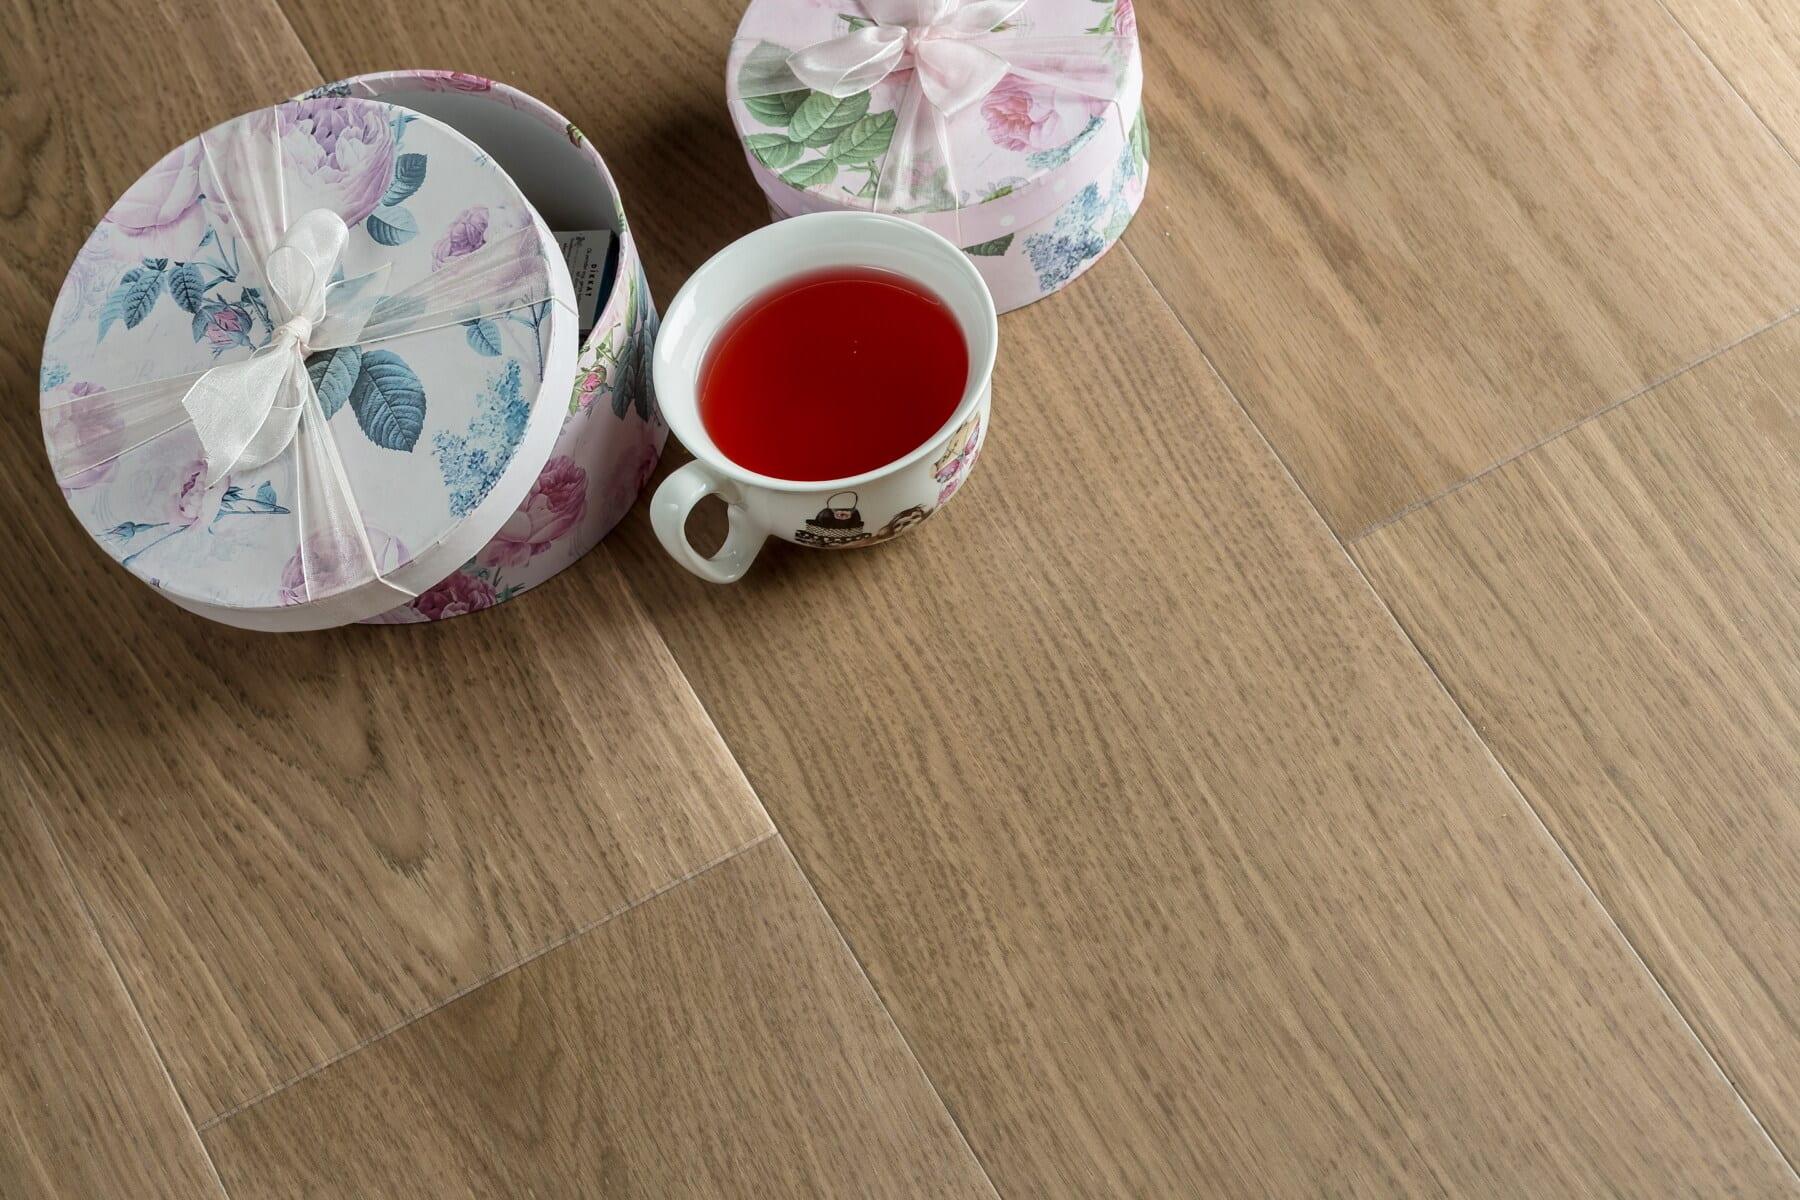 boxes, gifts, tea, mug, porcelain, floor, hardwood, parquet, cup, beverage